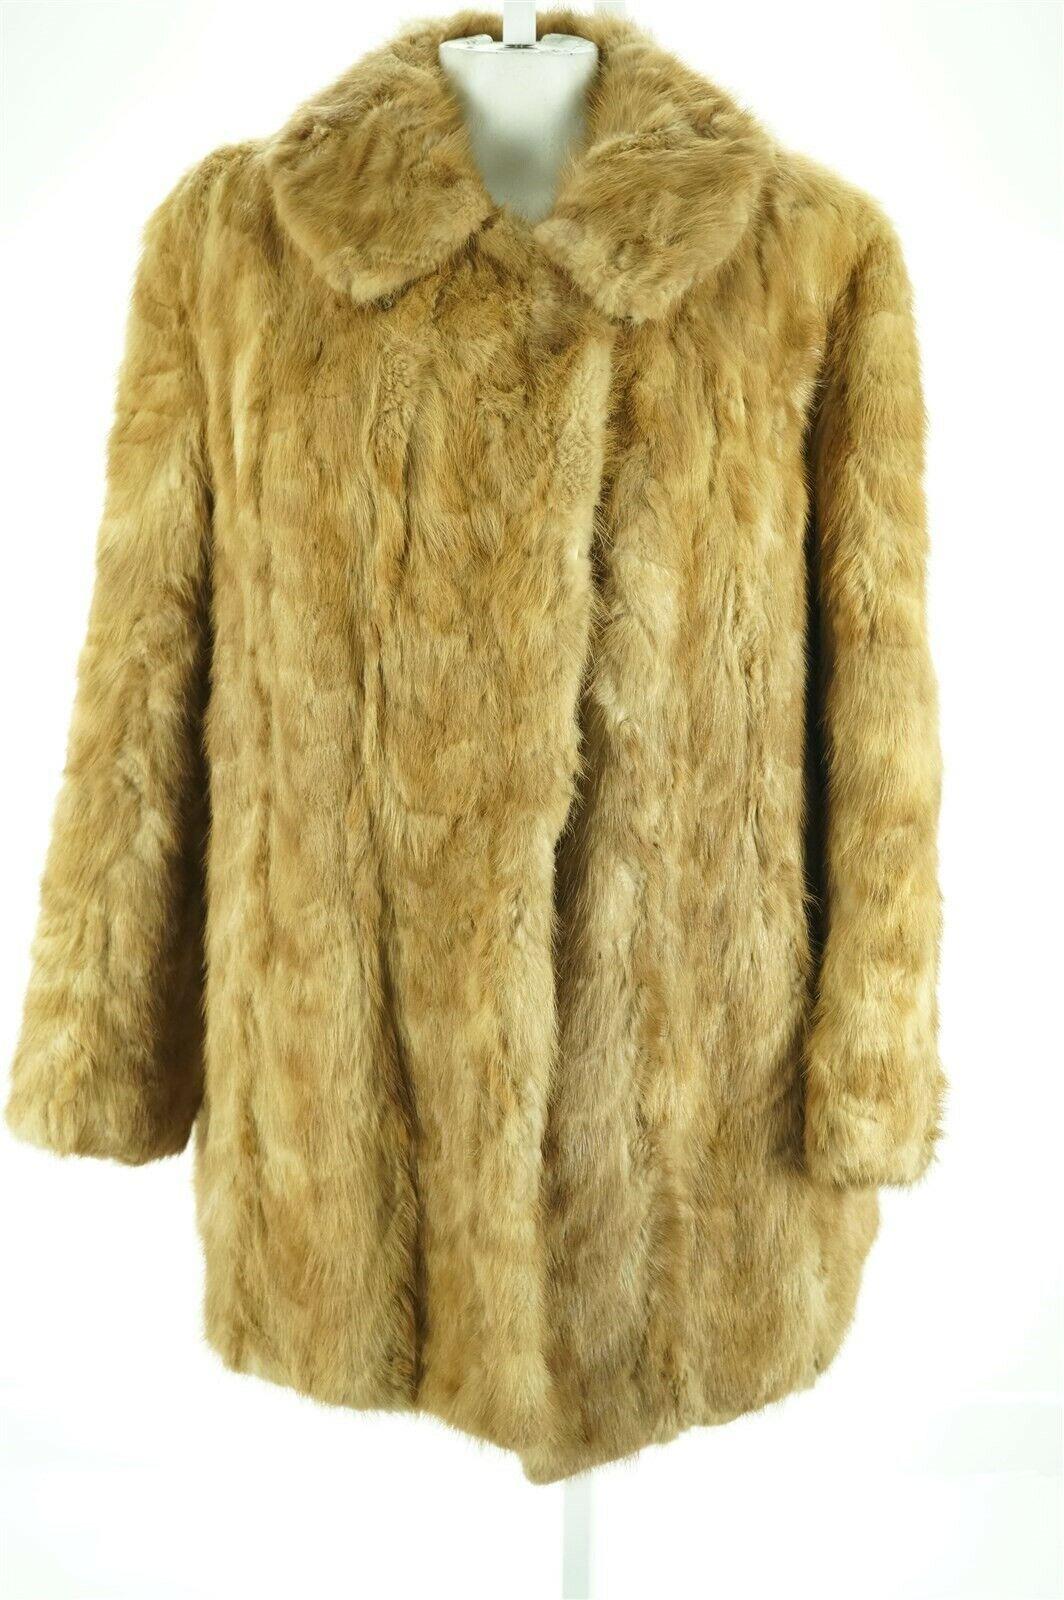 F08286 Craft Cutter Repurpose only Pastel Brown Sculptured Mink Real Fur Coat